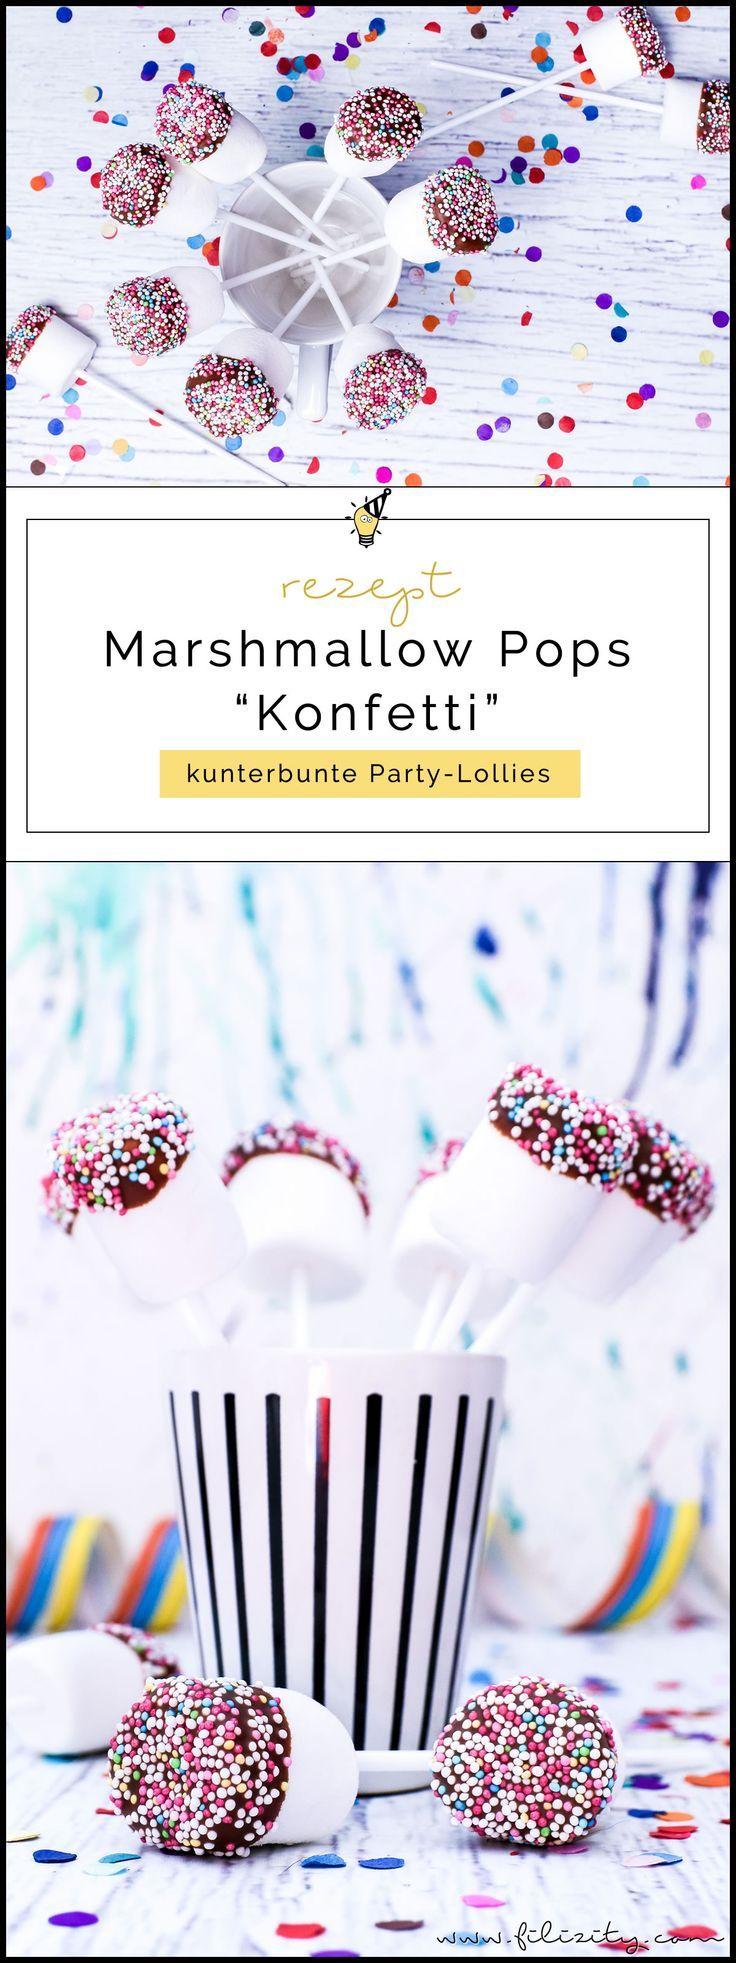 Schnelles Karnevals-Rezept: Marshmallow-Schoko-Pops Konfetti #marshmallow